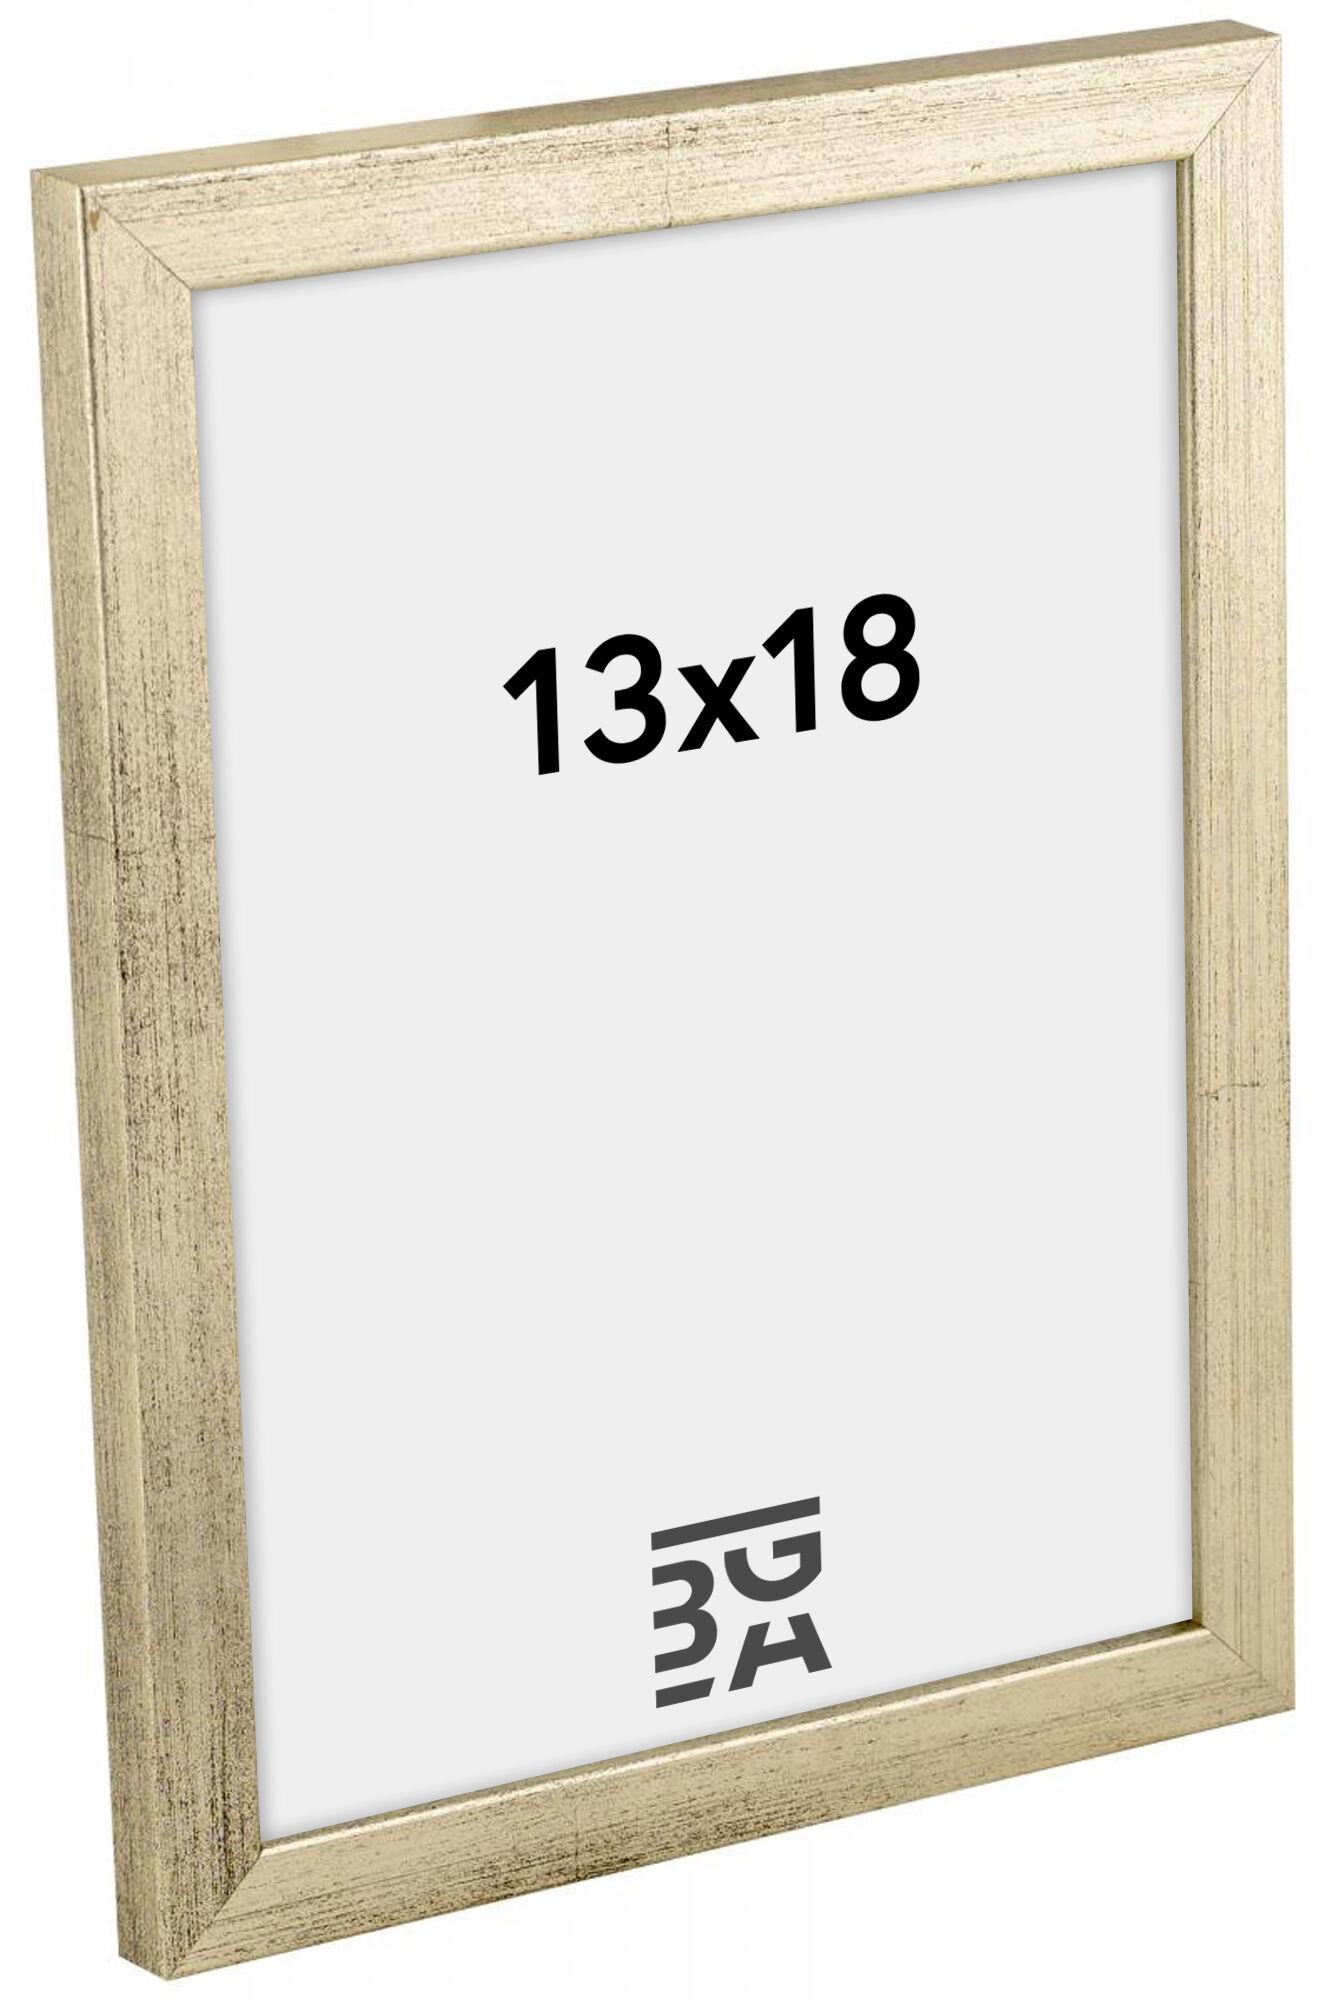 Estancia Galant Hopeanvärinen 13x18 cm